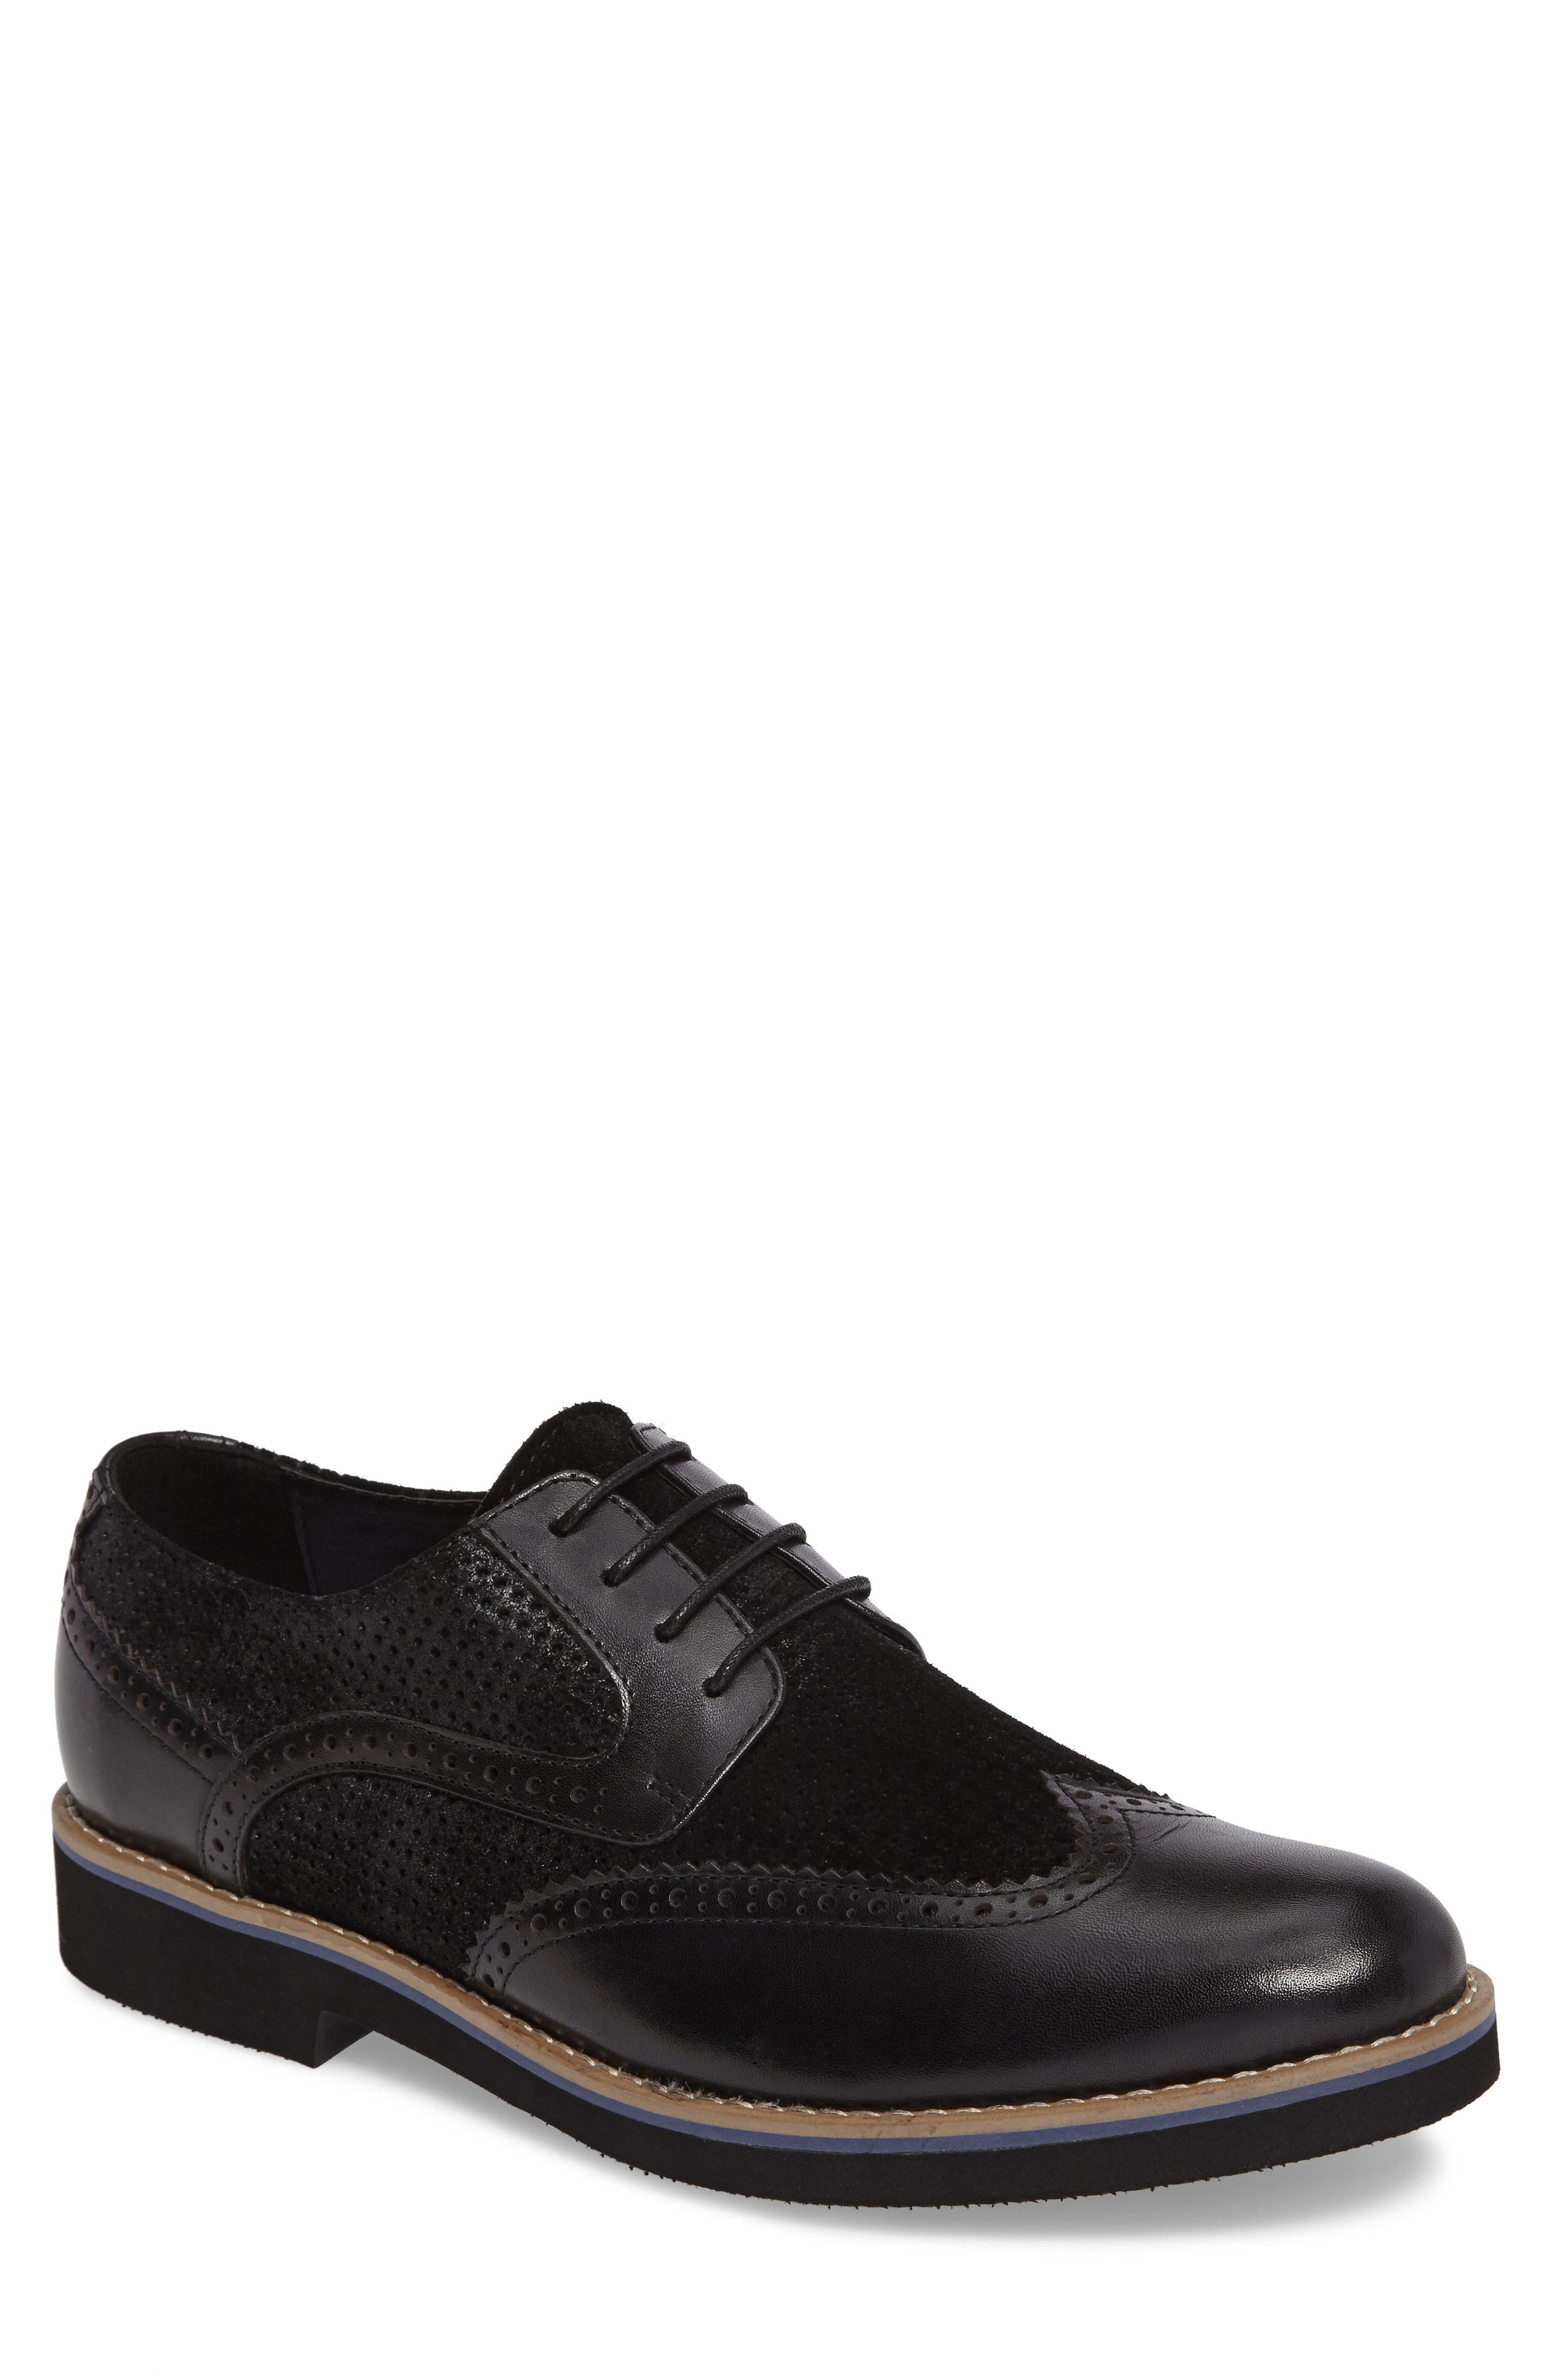 Main Image - English Laundry Maritime Spectator Shoe (Men)